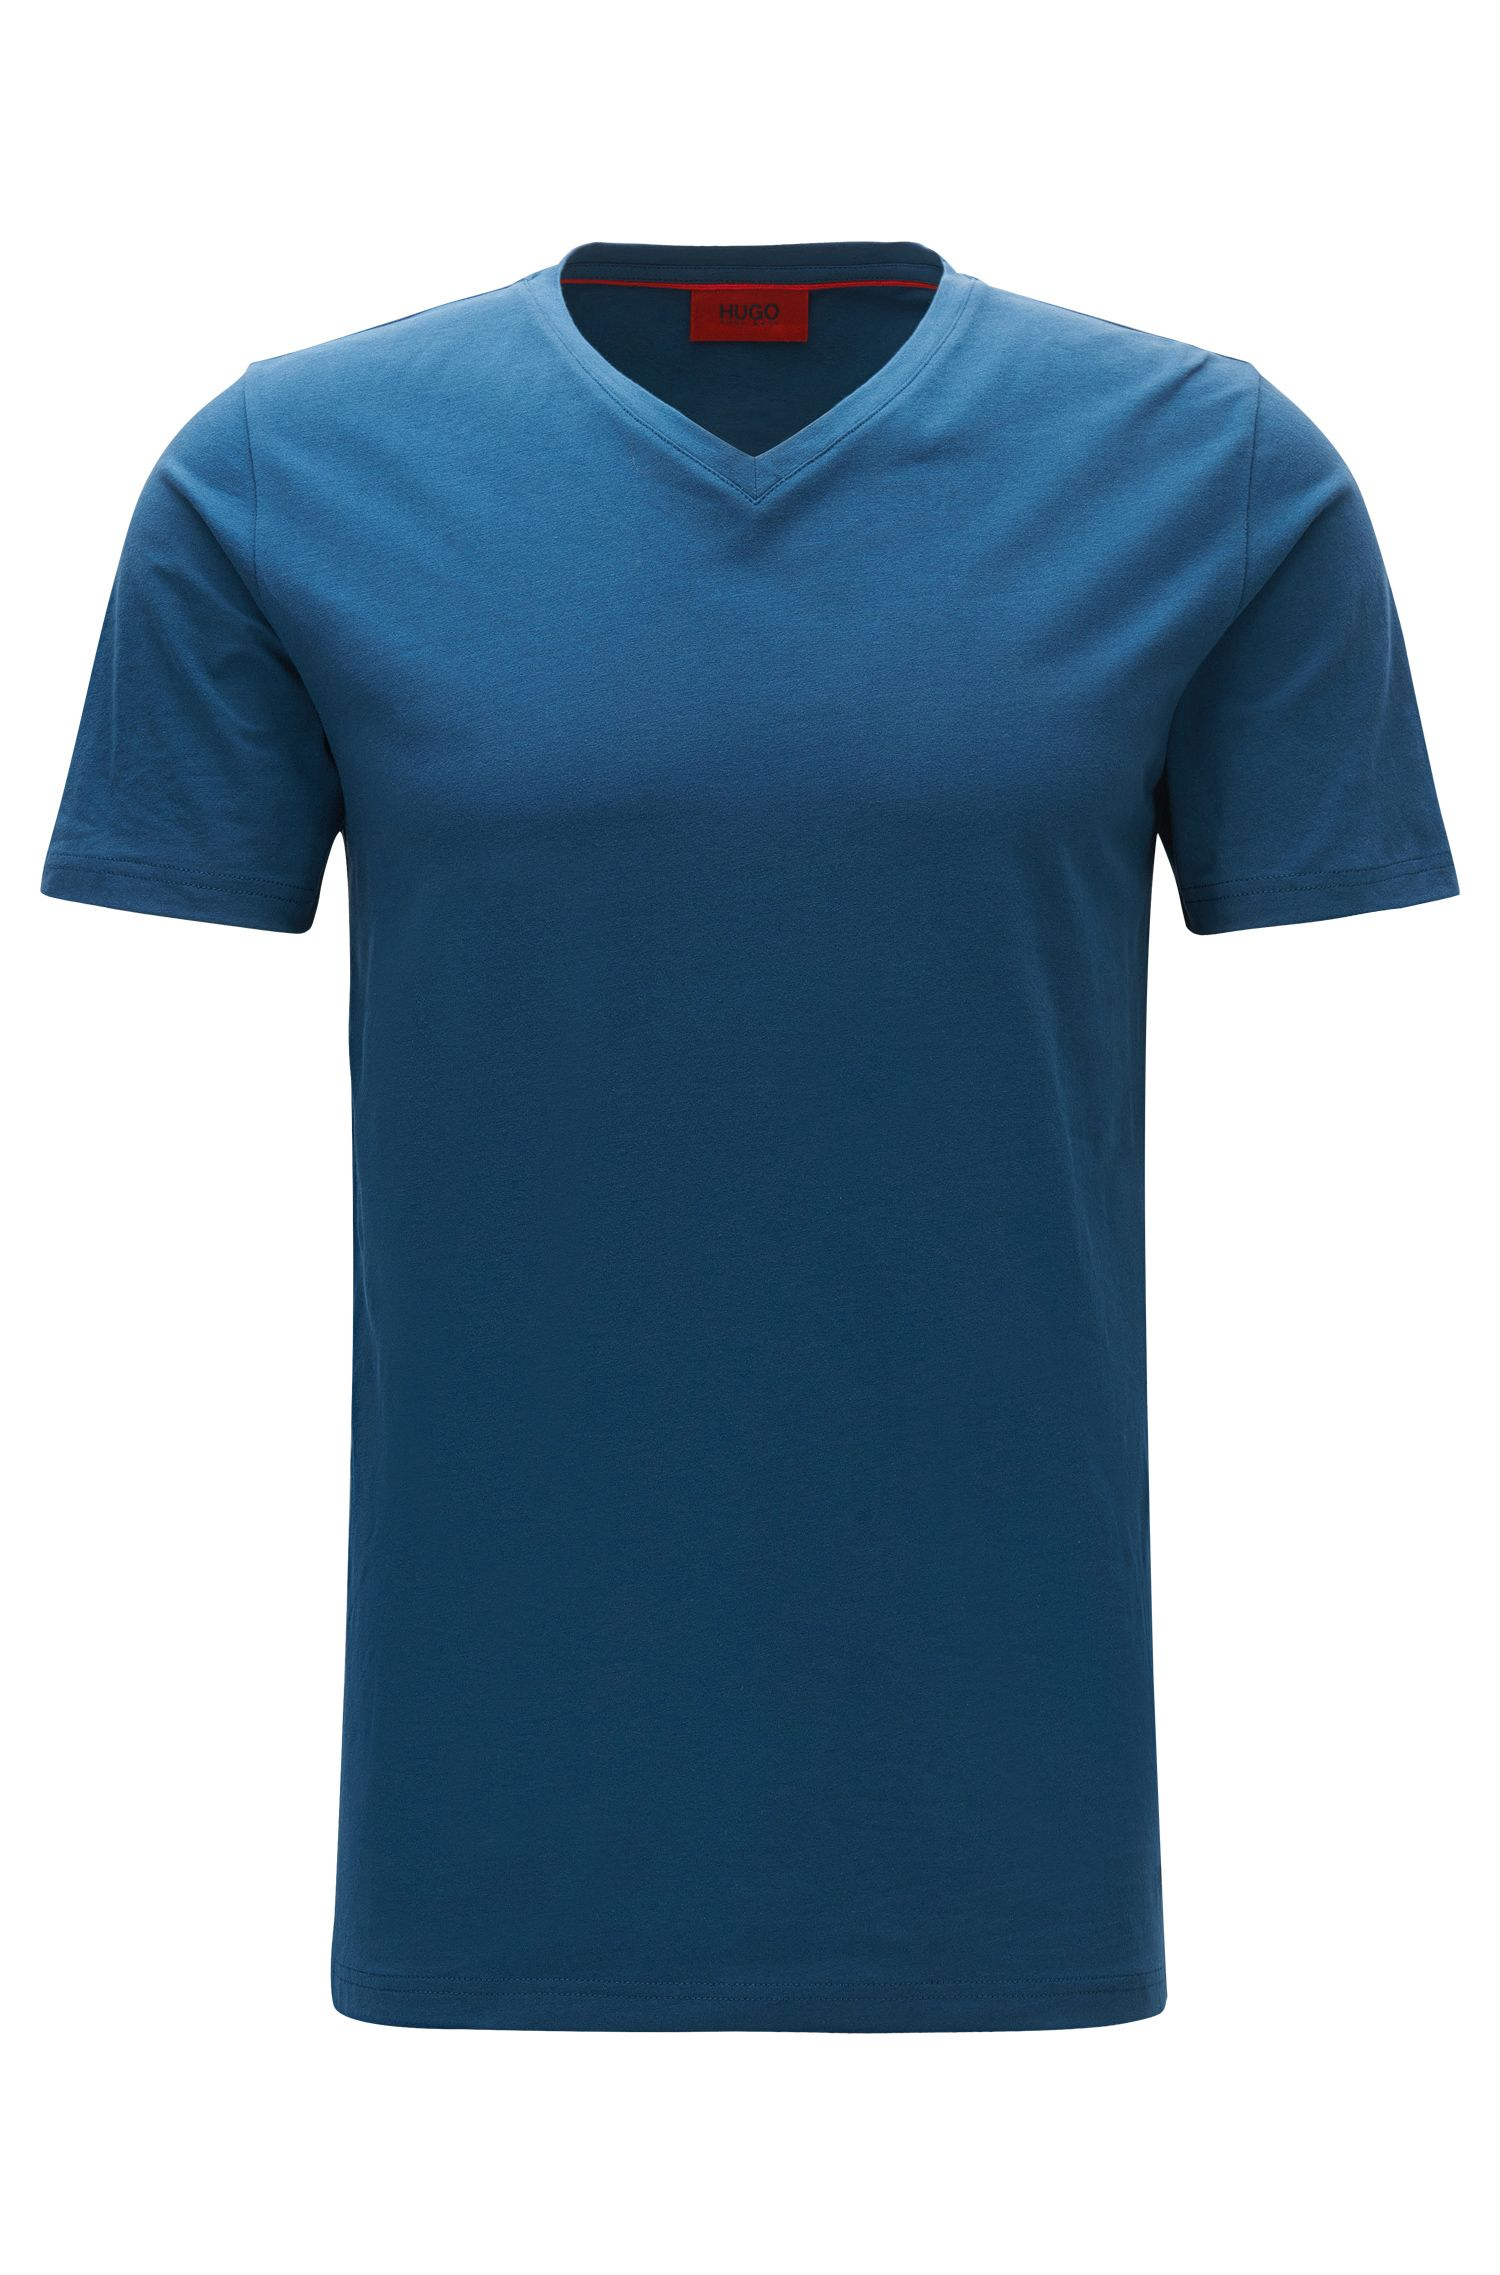 'Dandre' | Stretch Cotton Jersey T-Shirt